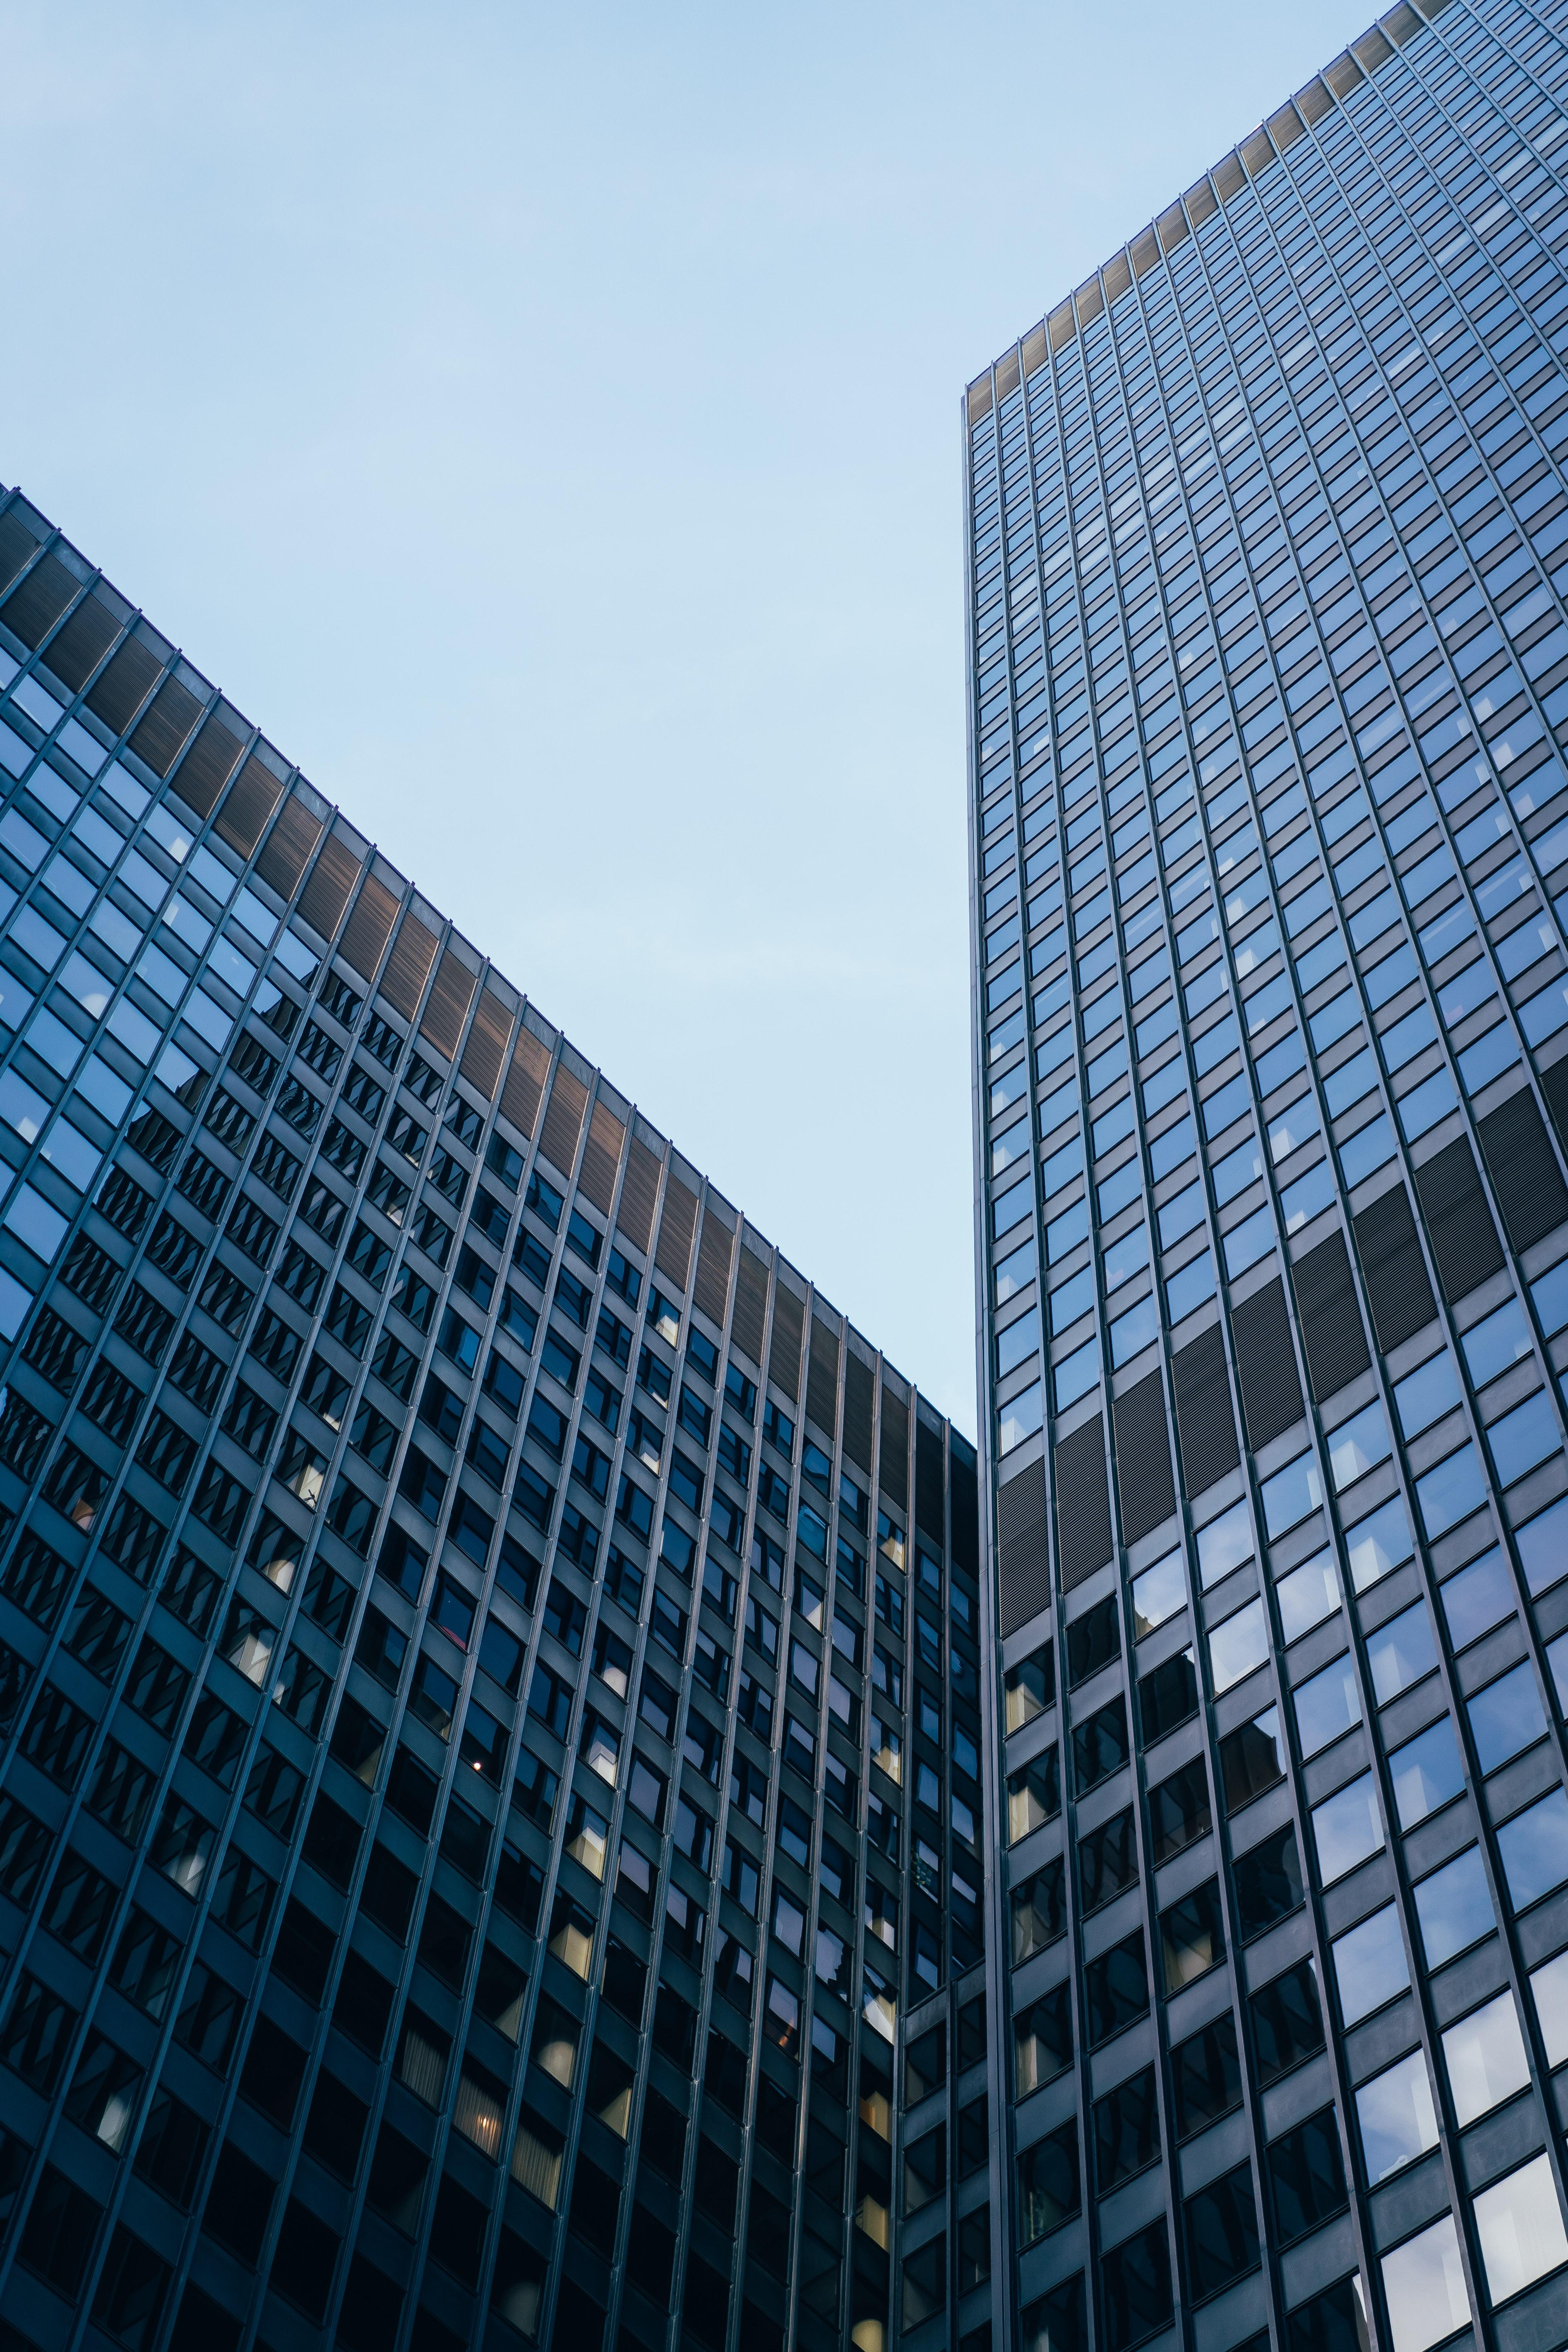 architecture-building-building-exterior-2295433